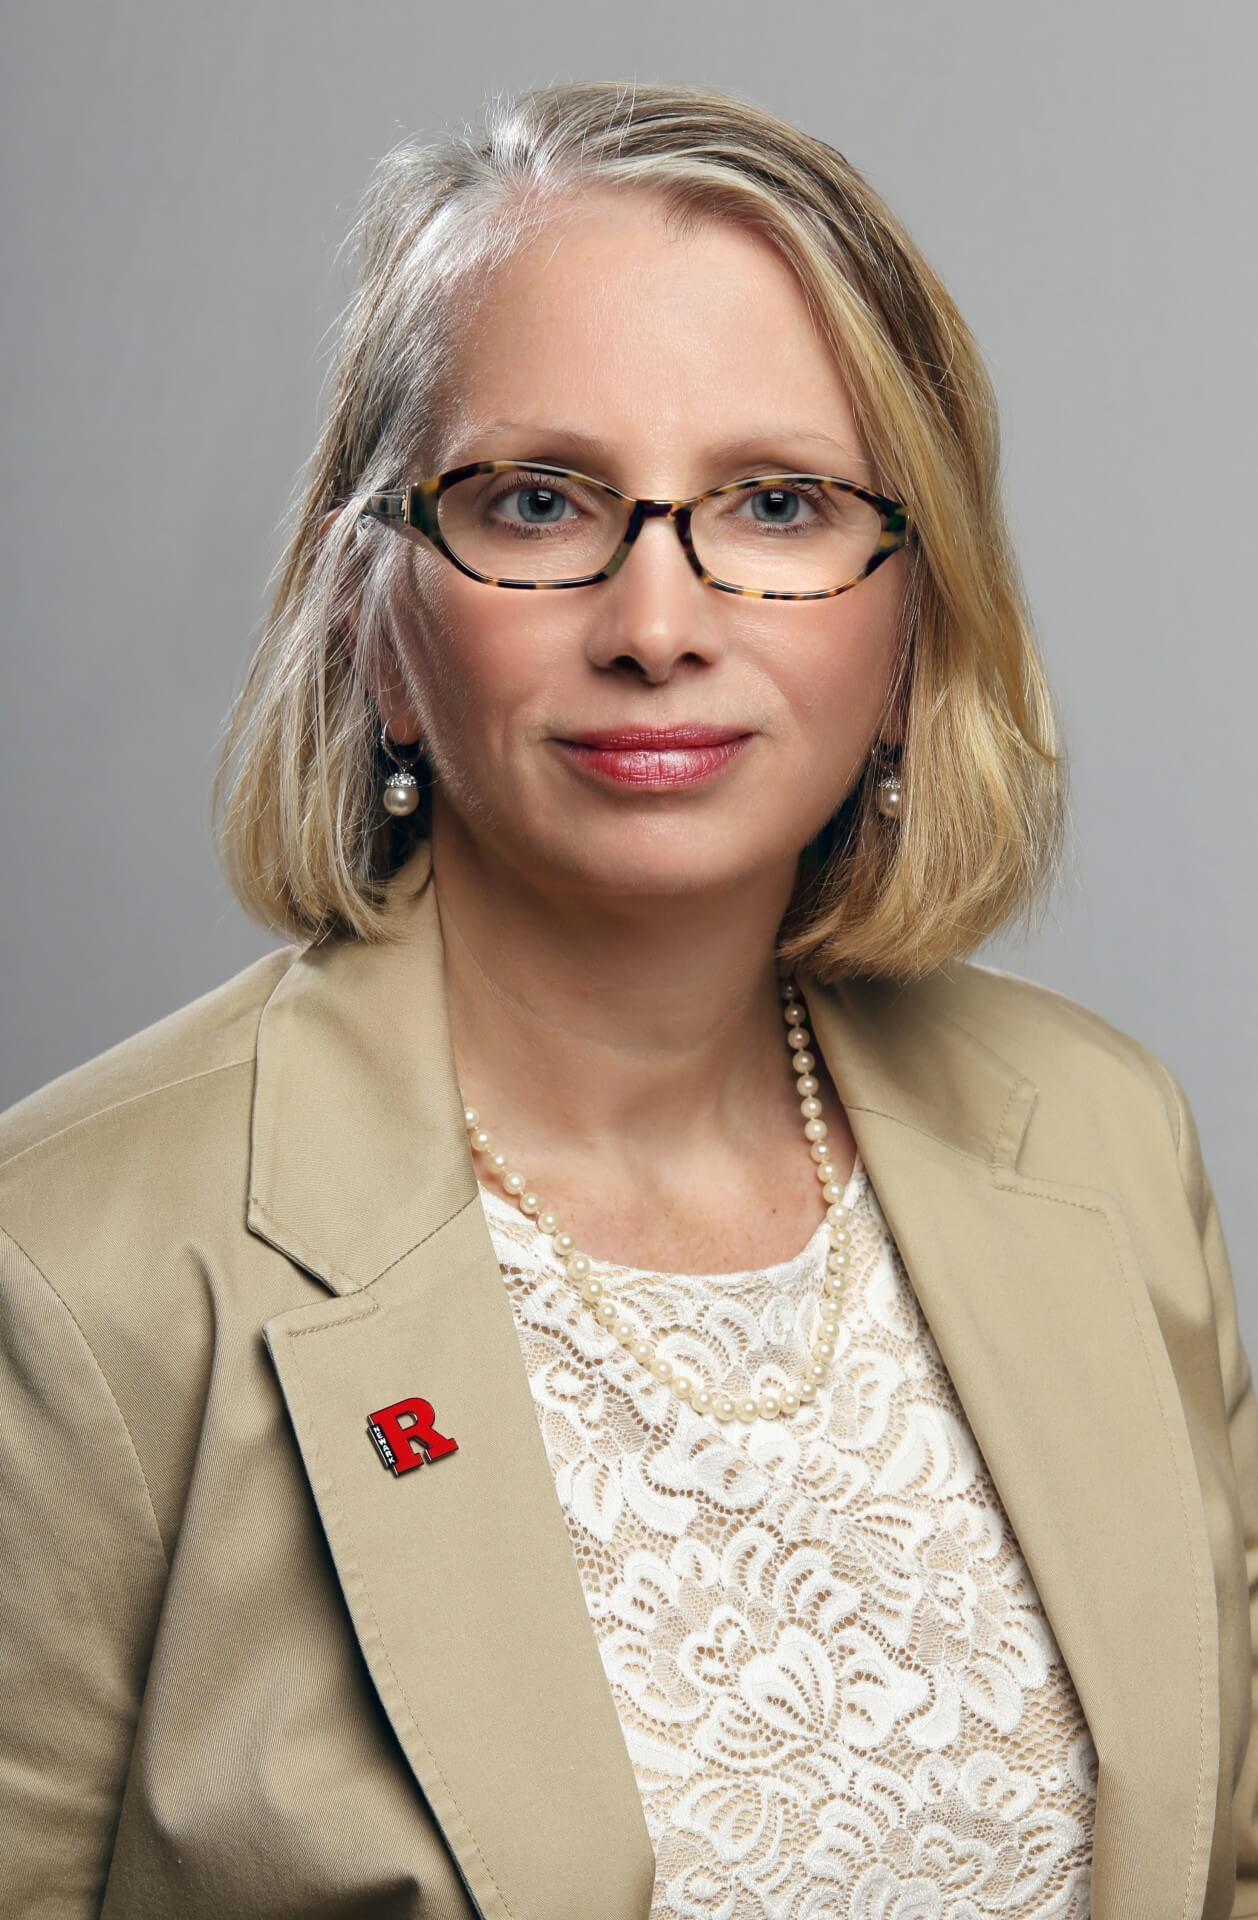 Irene M. O'Brien